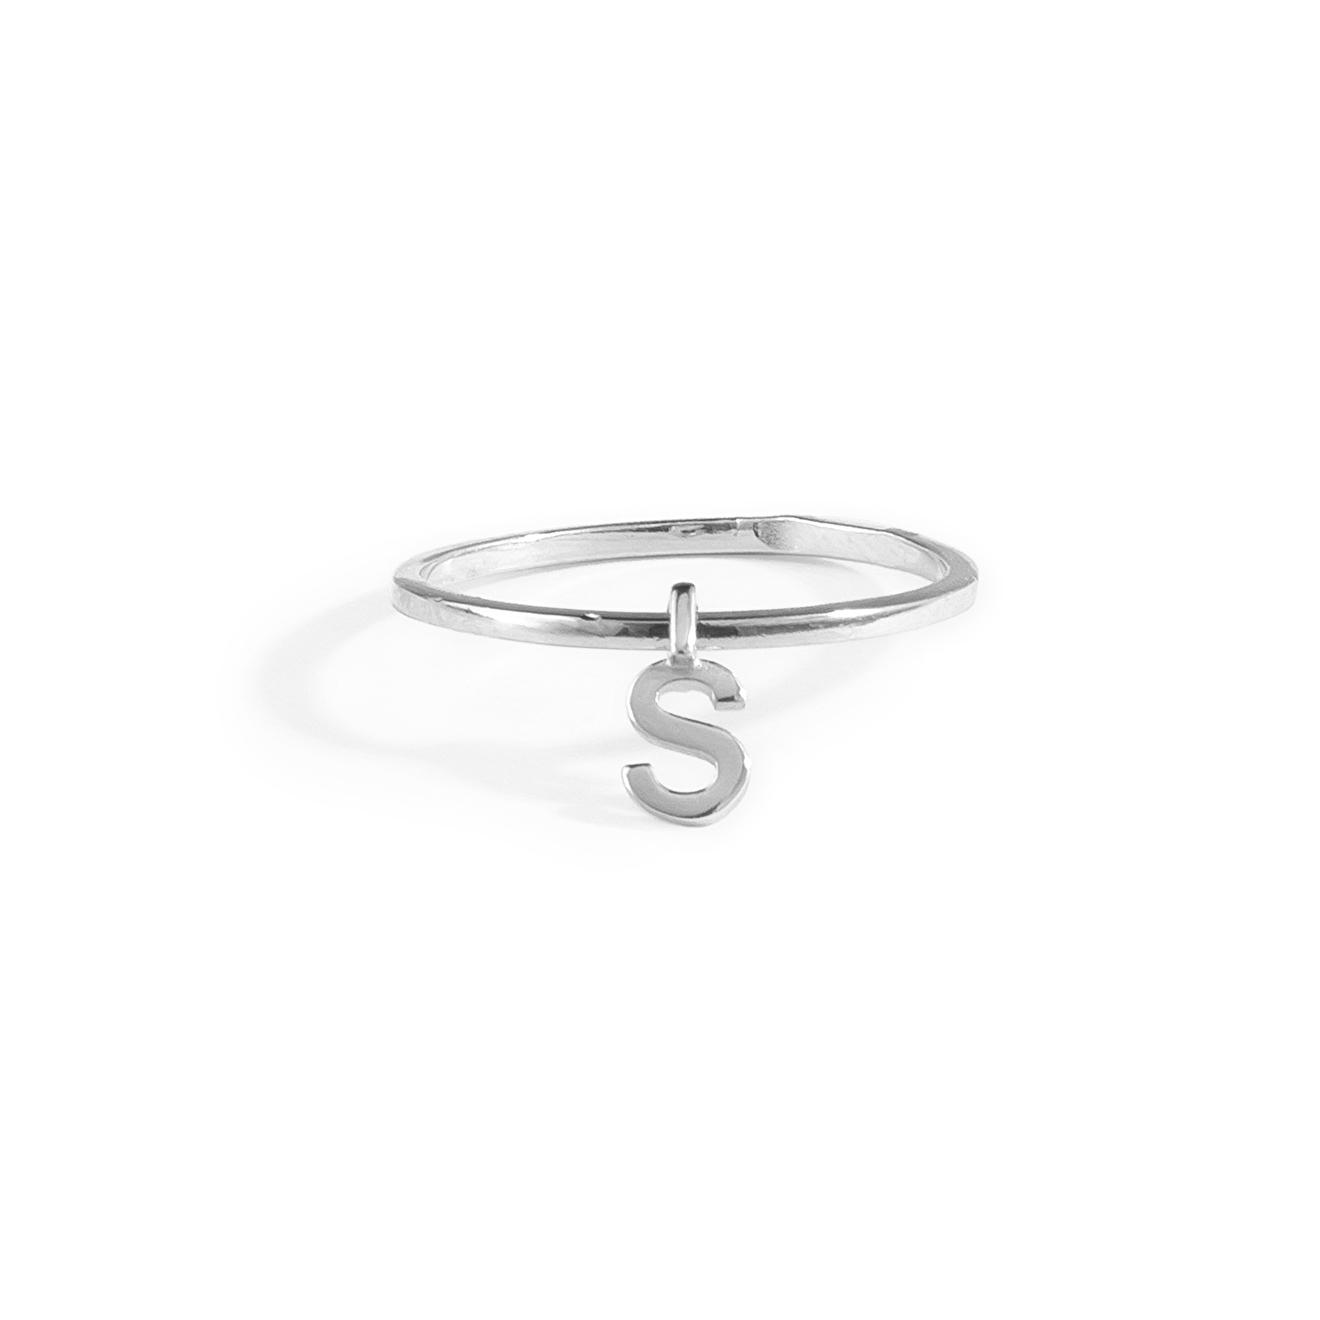 Фото - Ringstone Кольцо из серебра с буквой S ringstone жемчужное ожерелье с буквой s ringstone